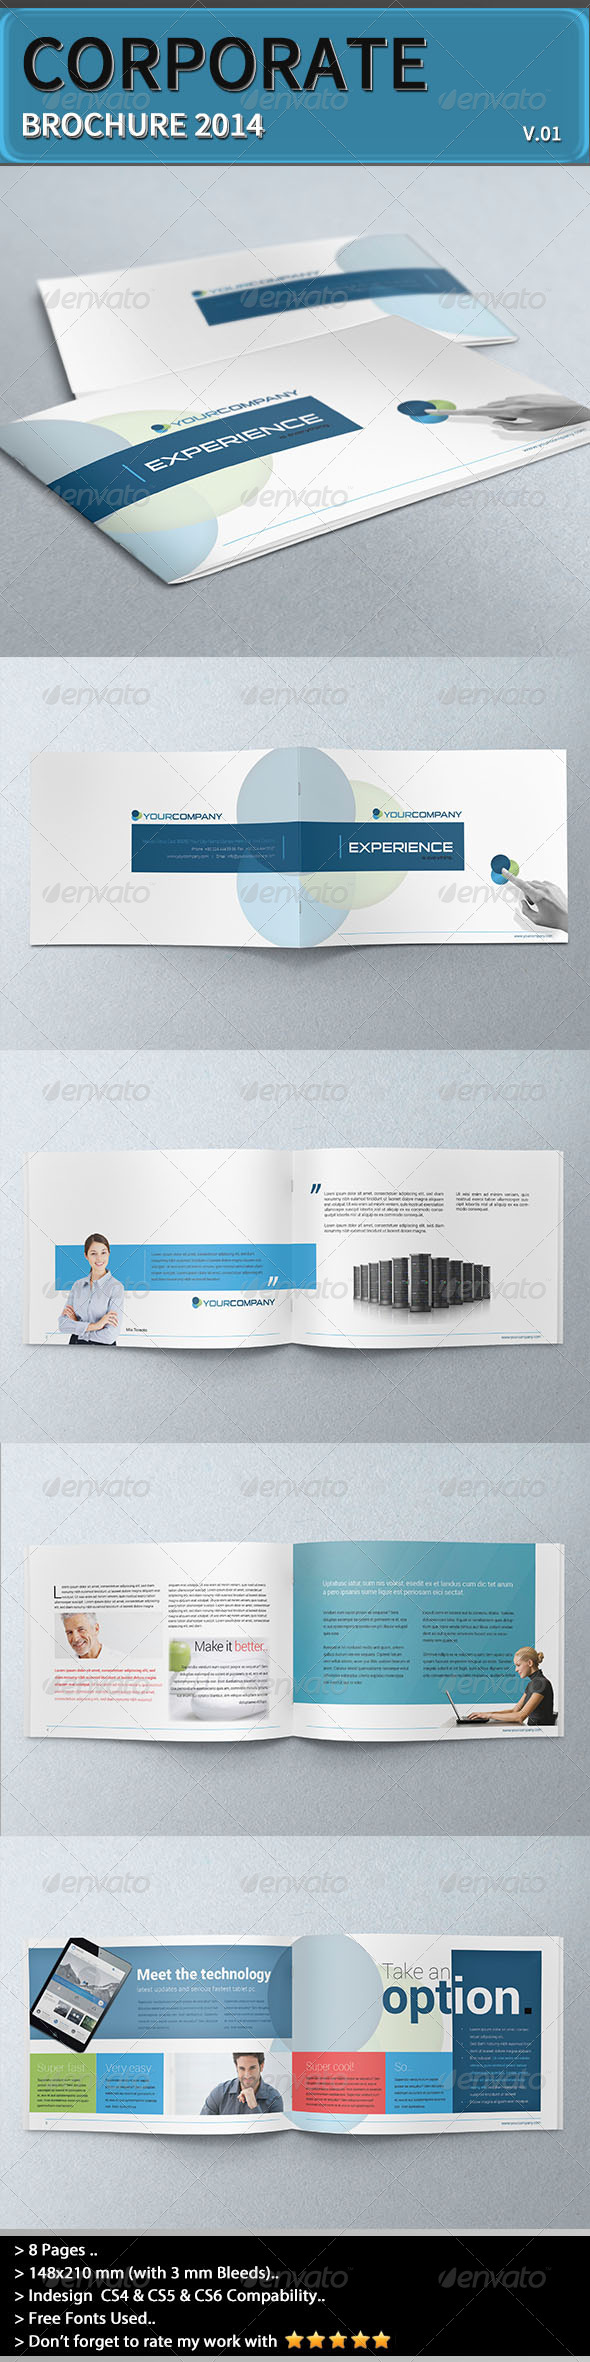 Corporate Brochure - Experience - Corporate Brochures